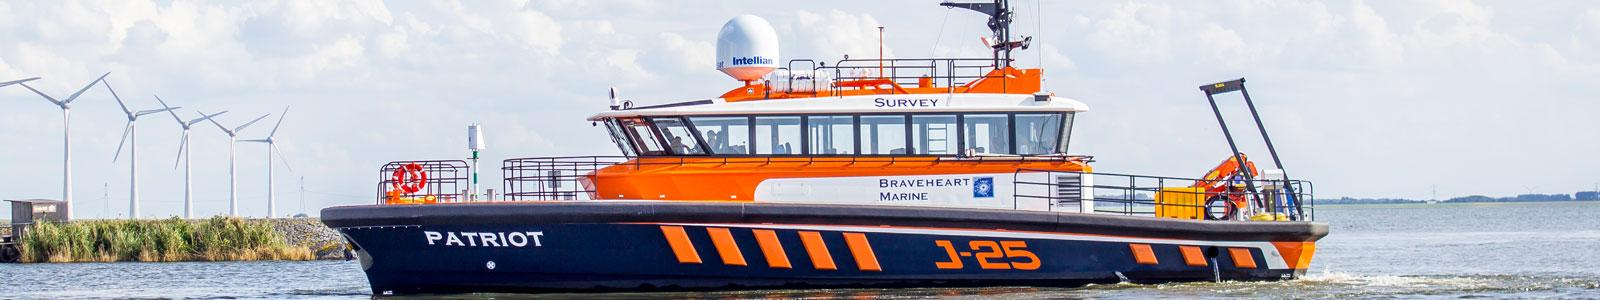 Projects-2017-09-workboat-windfarms-support-Javelin-international-Patriot-header.jpg